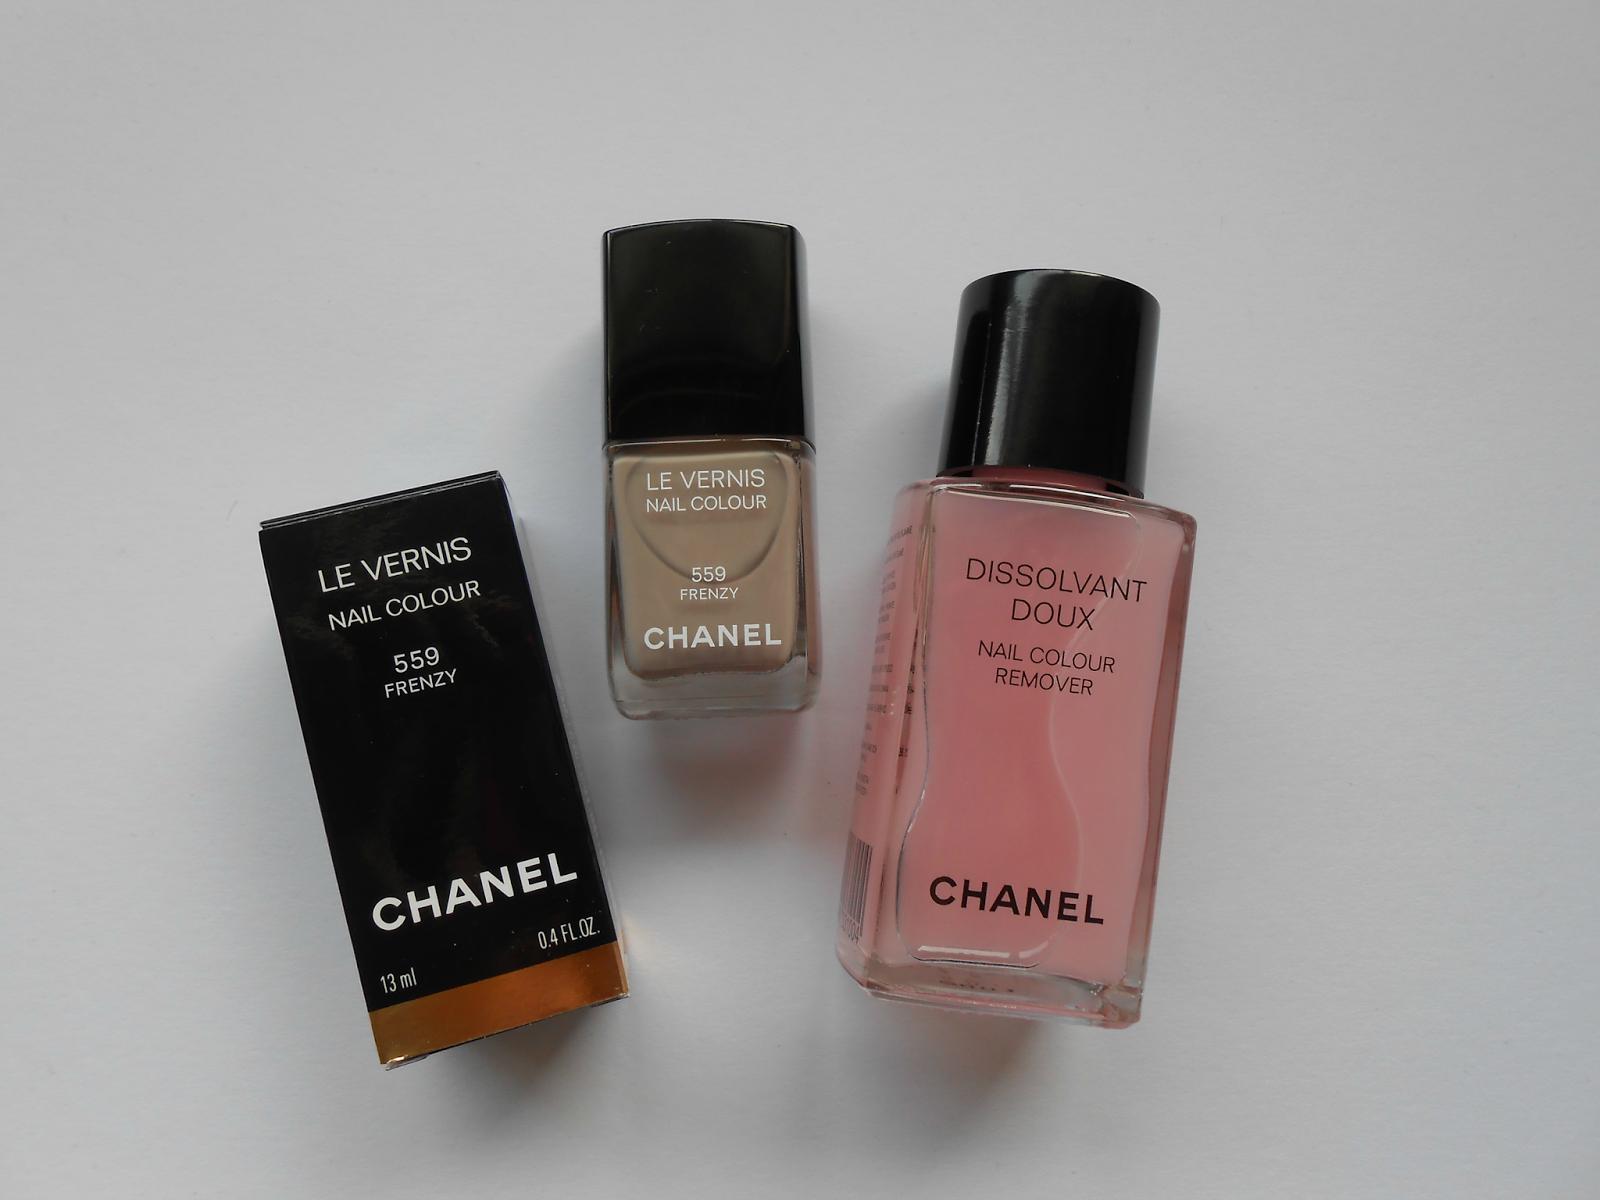 Chanel Nail Polish Remover Review